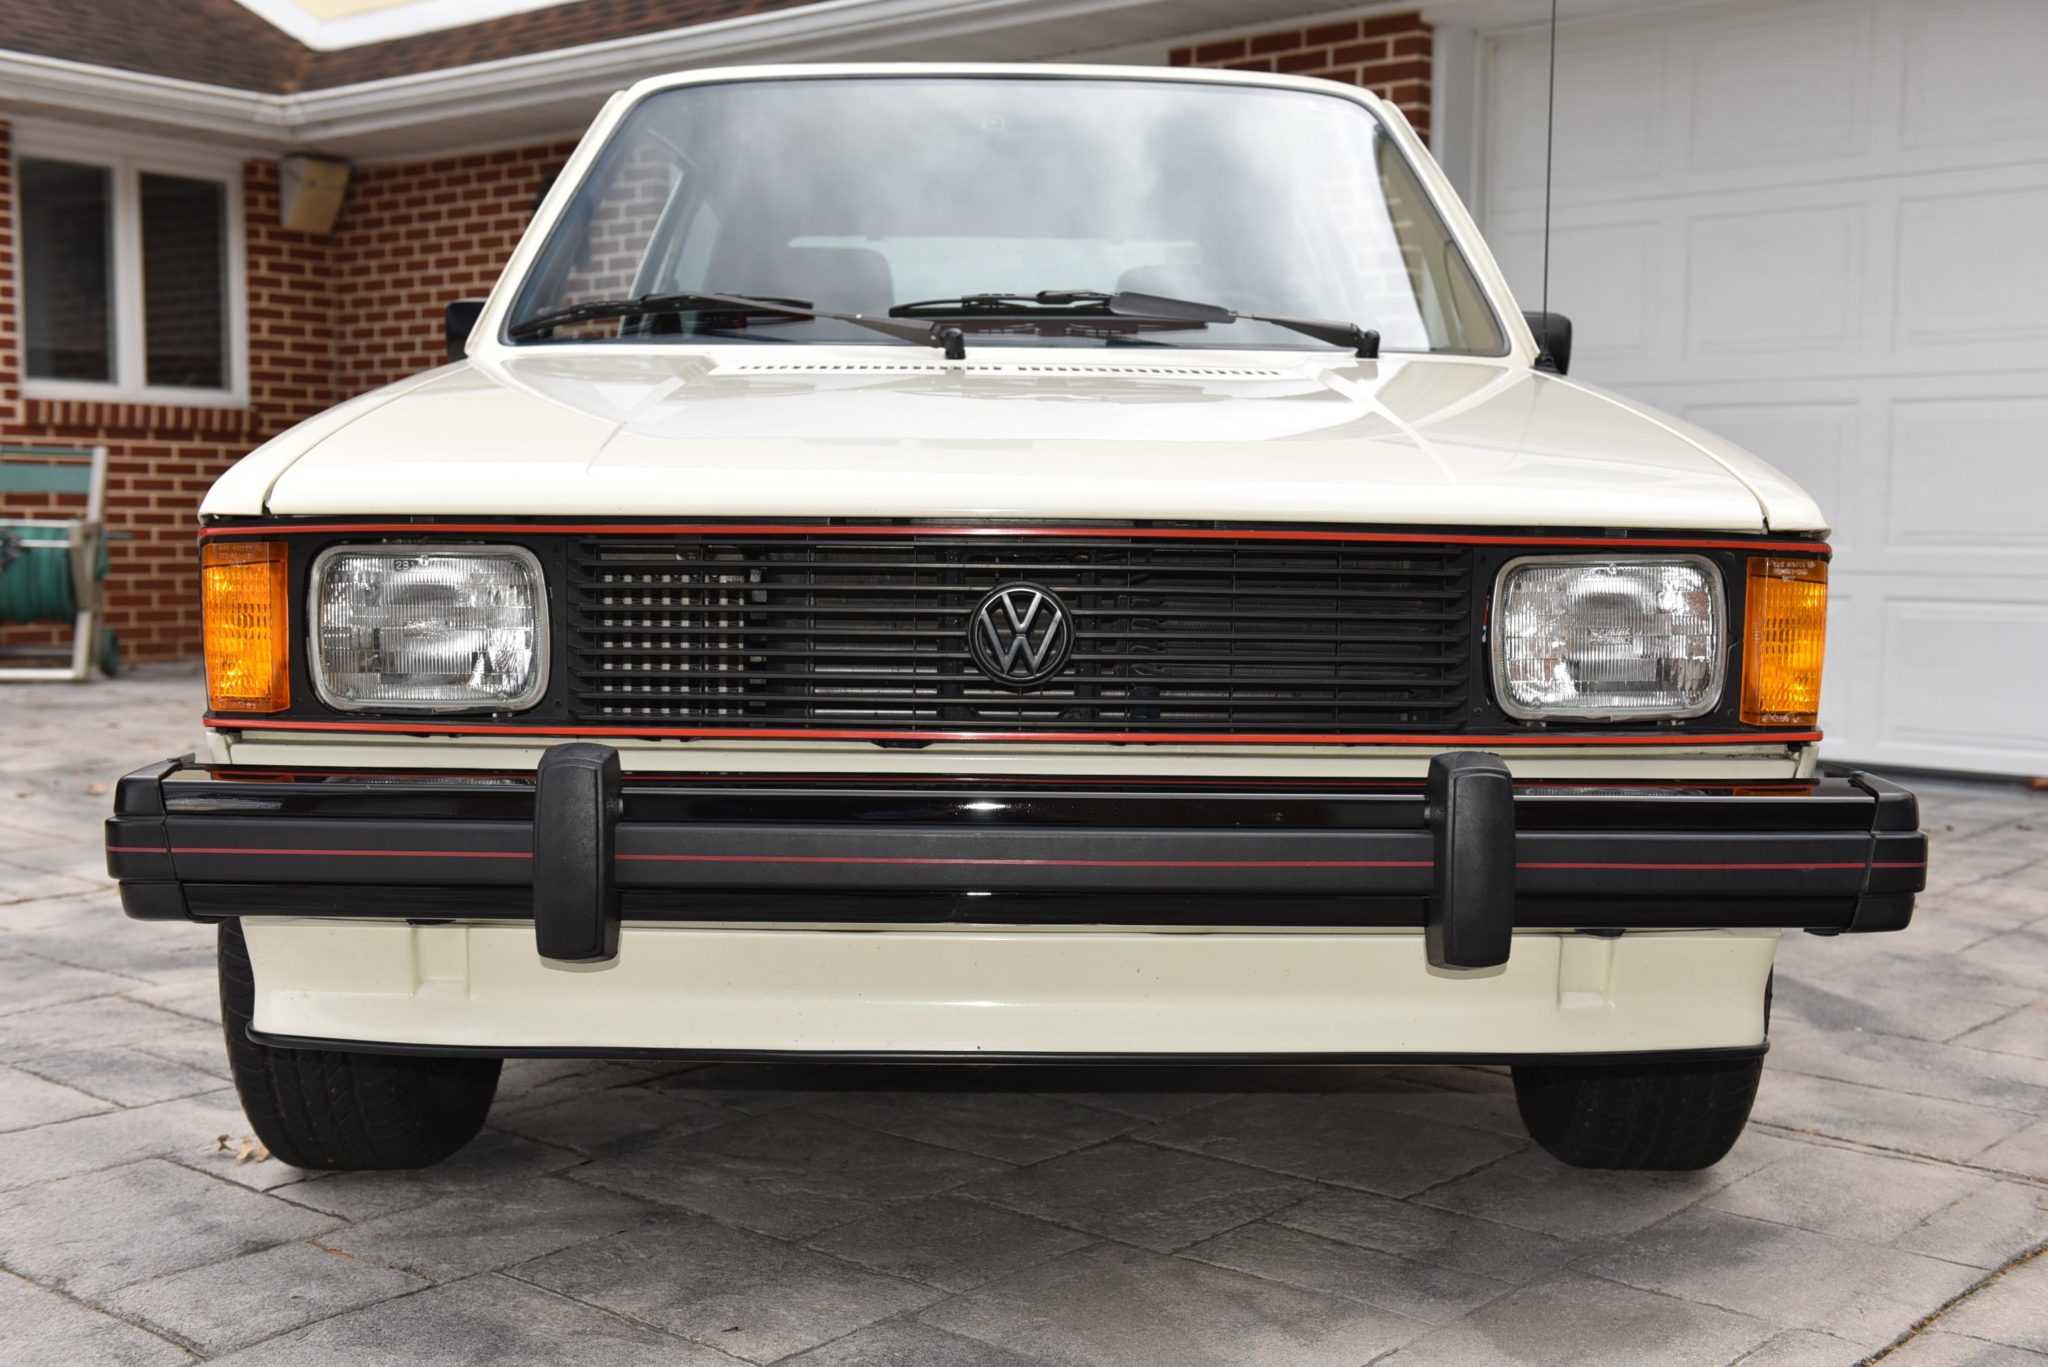 1983_volkswagen_rabbit_gti_15870390927b9c27f8dLEM_9906-scaled